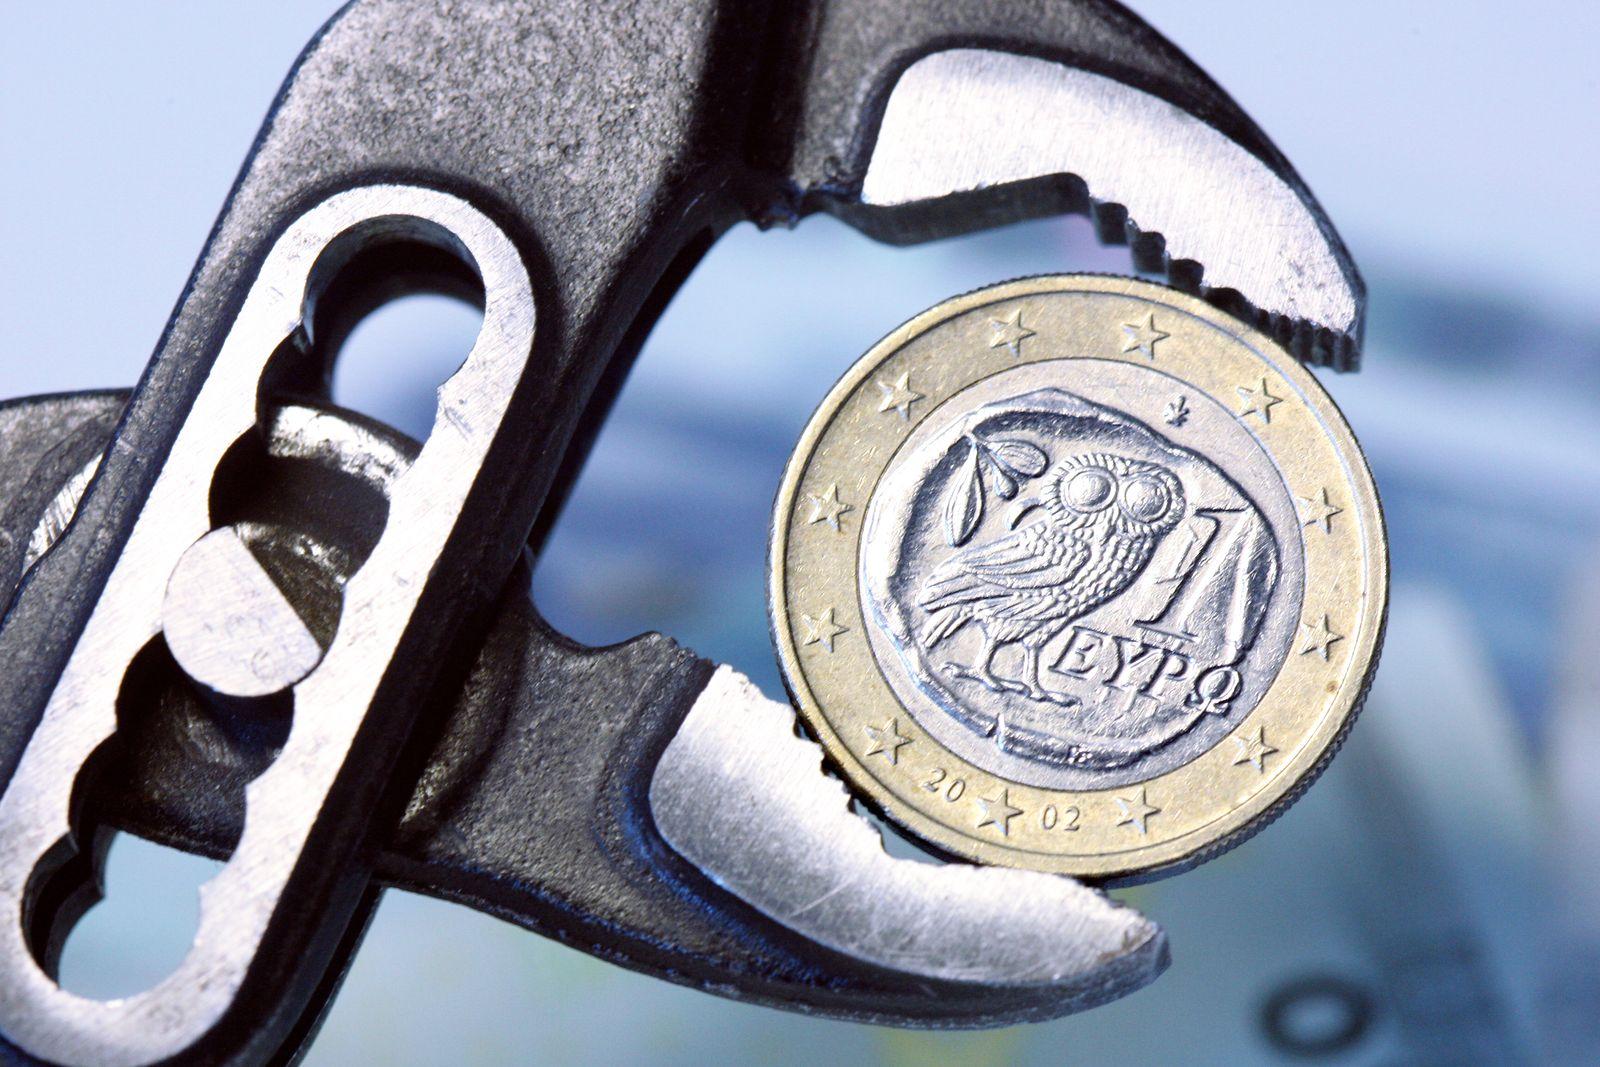 Euro in der Zange / Euro-Krise